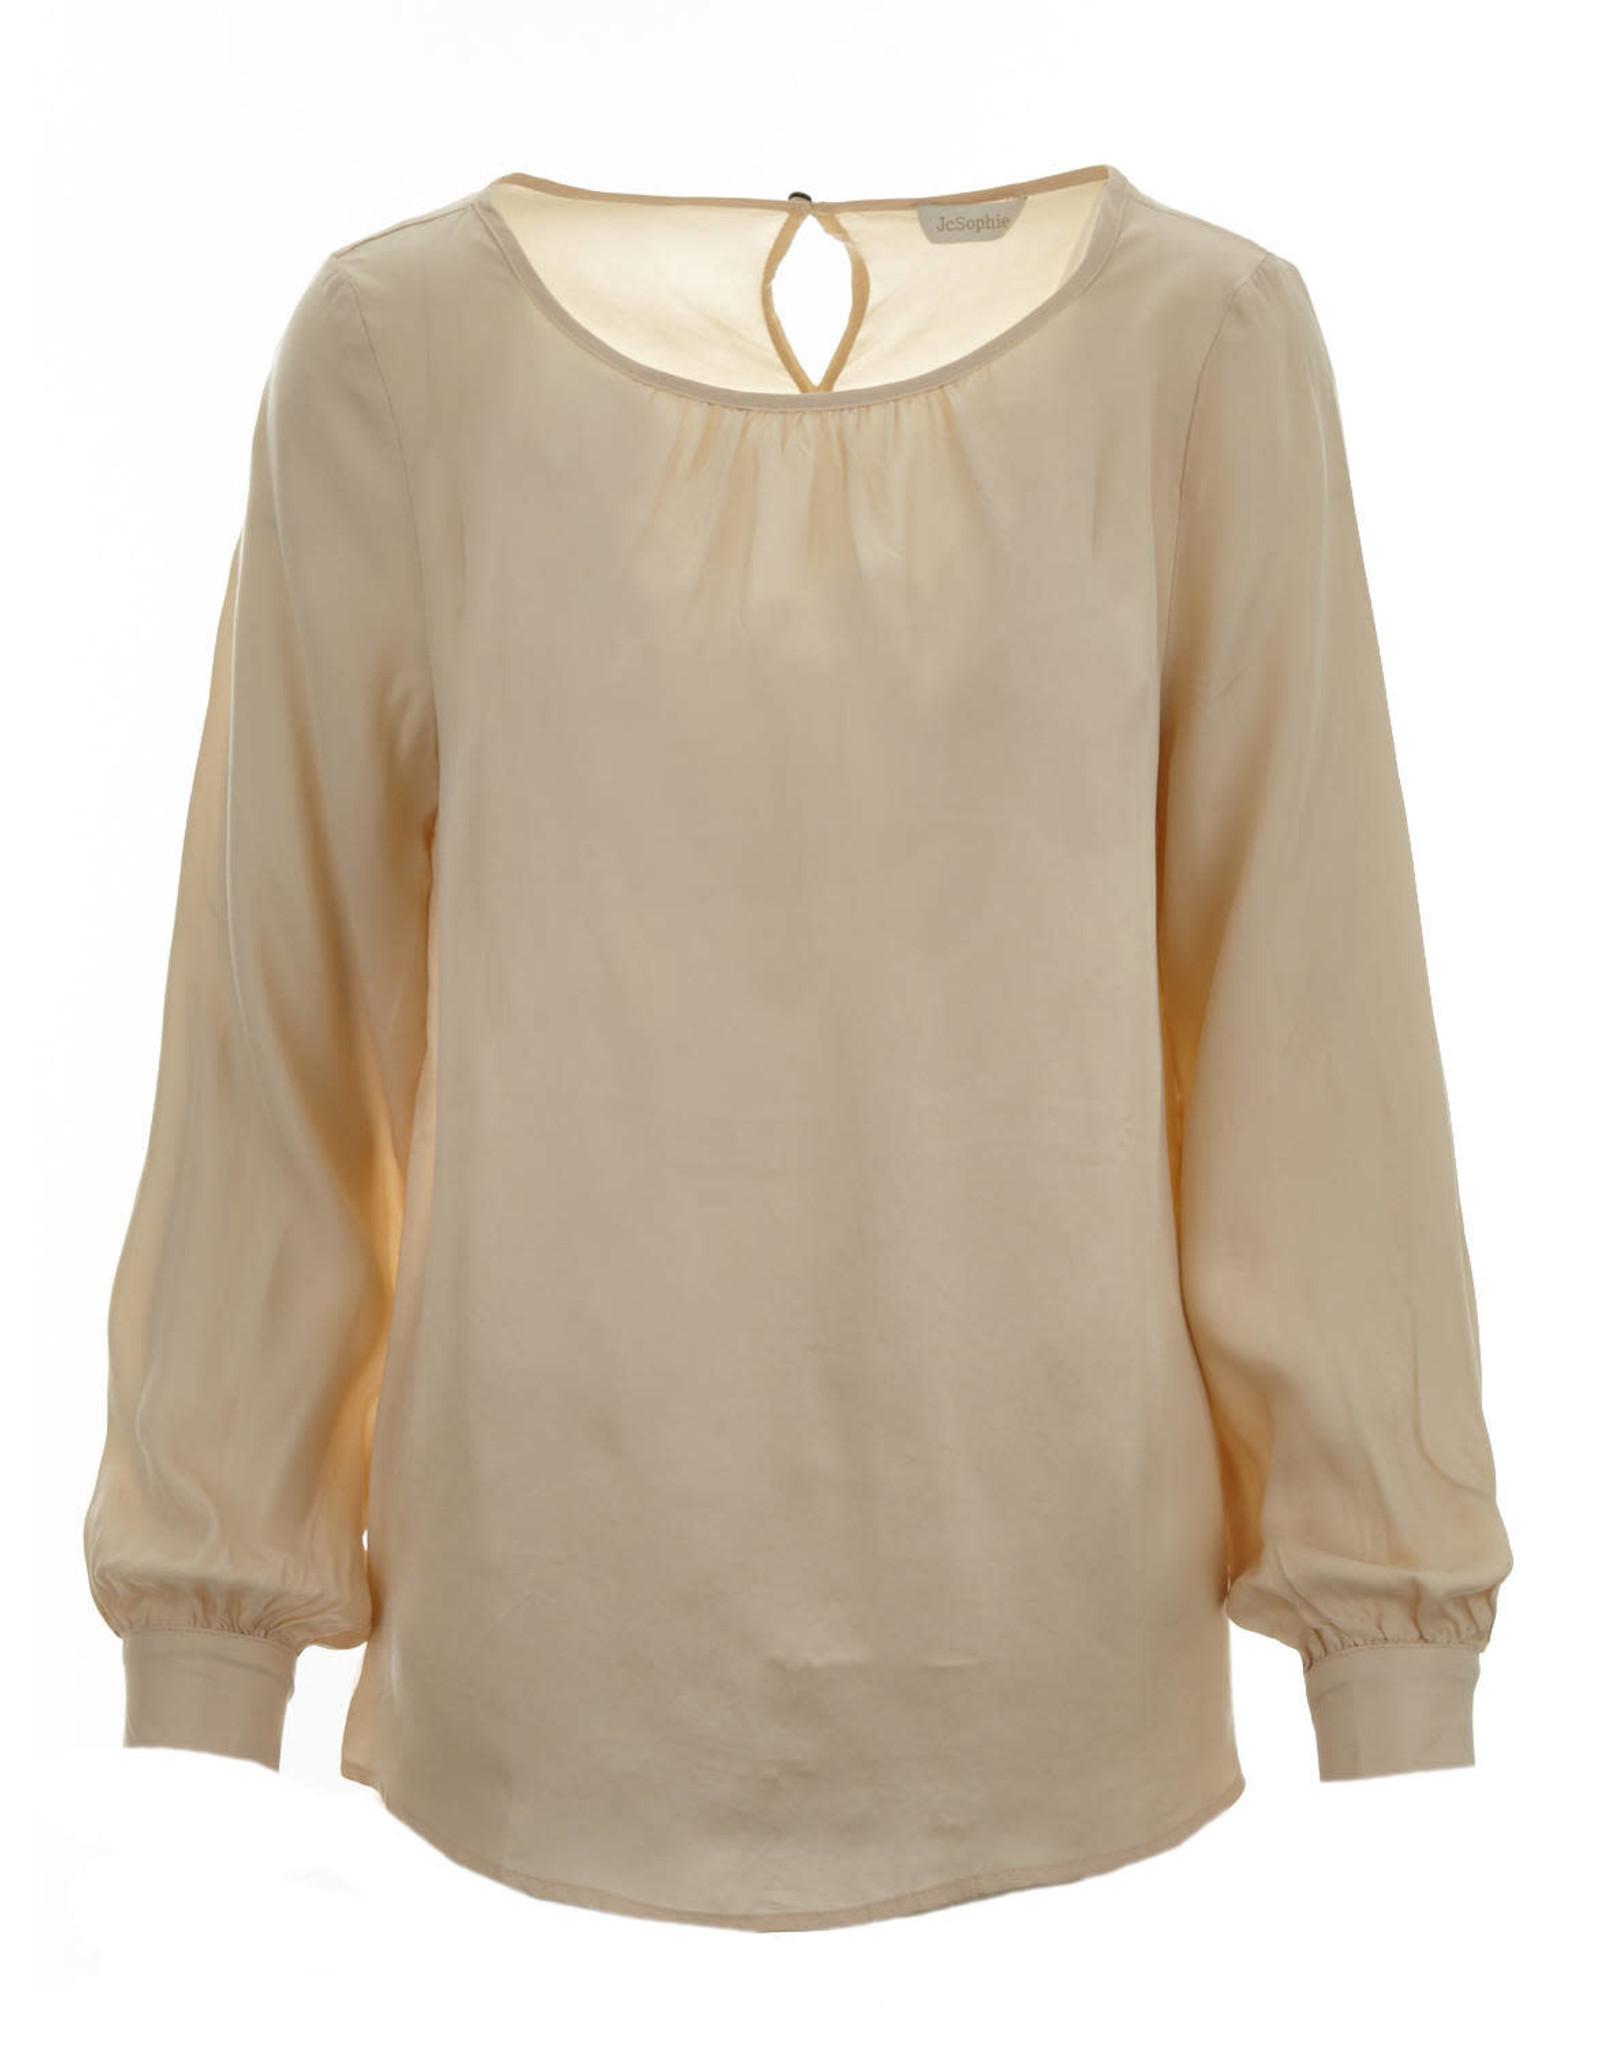 JcSophie JcSophie Elliot blouse E7054-111